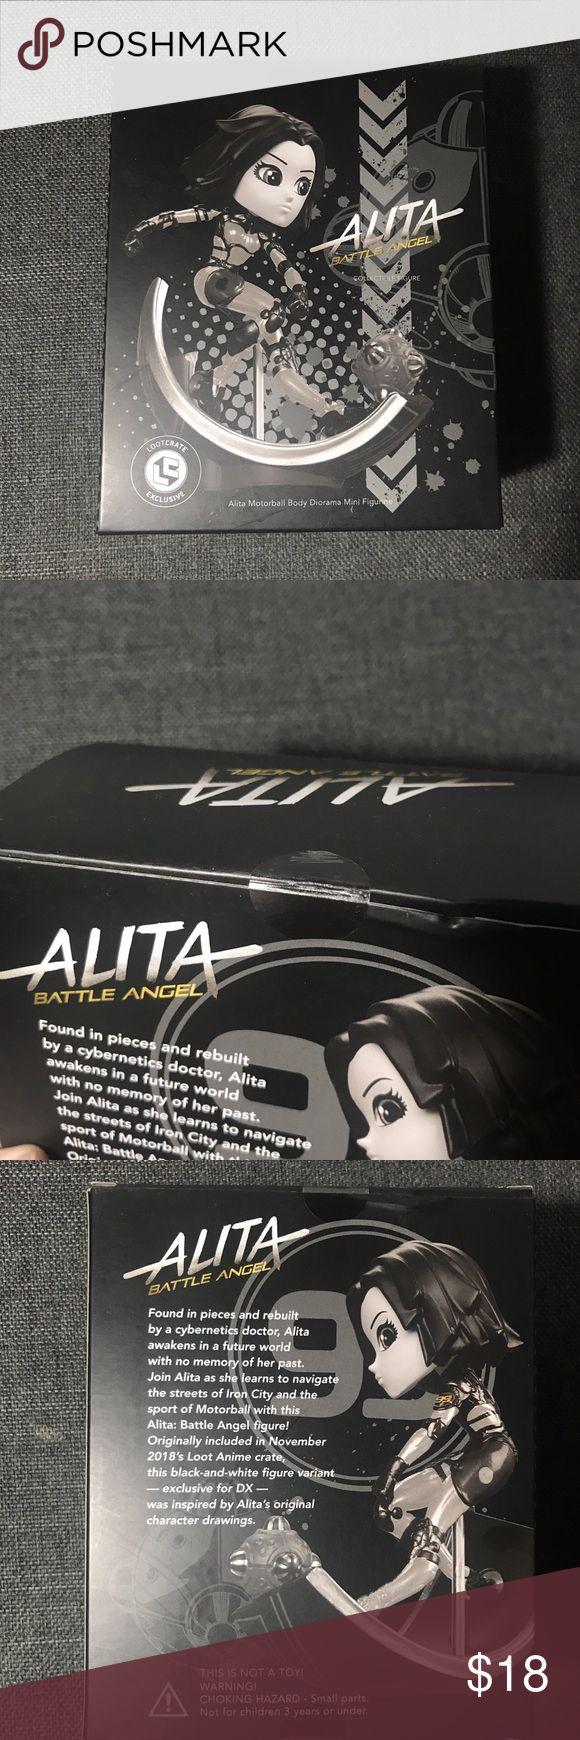 VARIANT Alita Battle Angel Collectible Figurine Alita Battle Angel Collectible F…